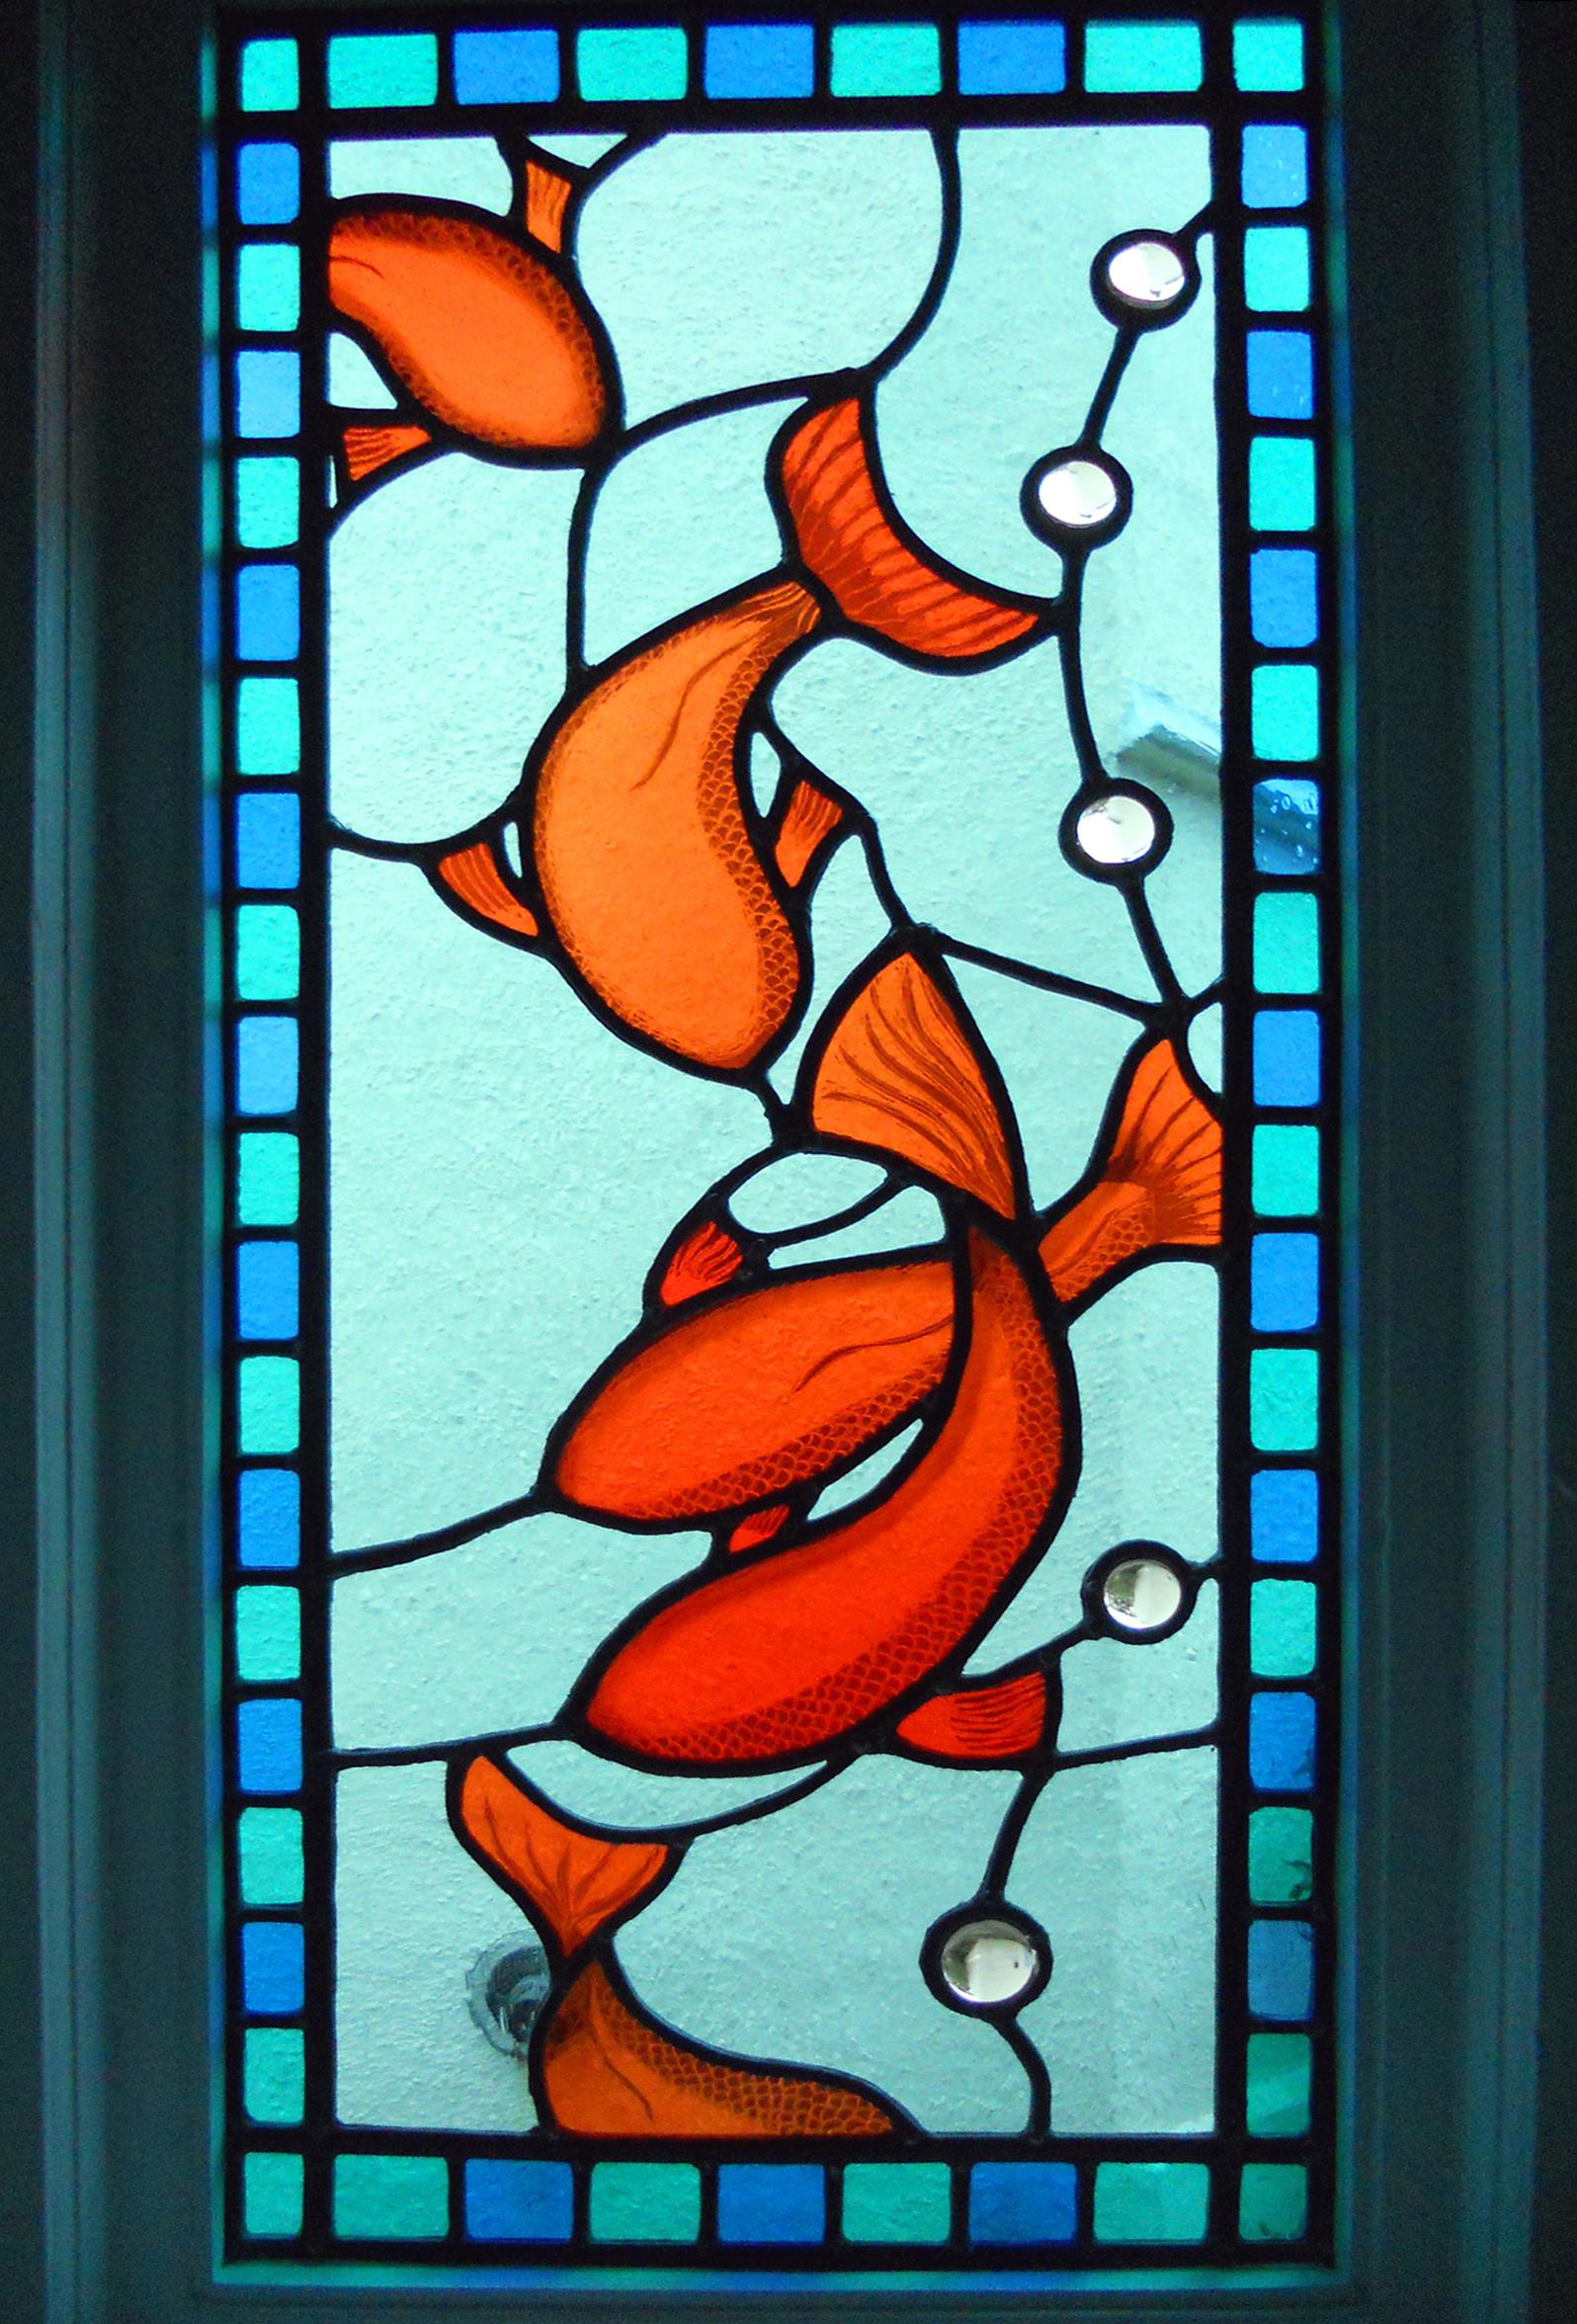 BEER_FISH_WINDOW1.jpg